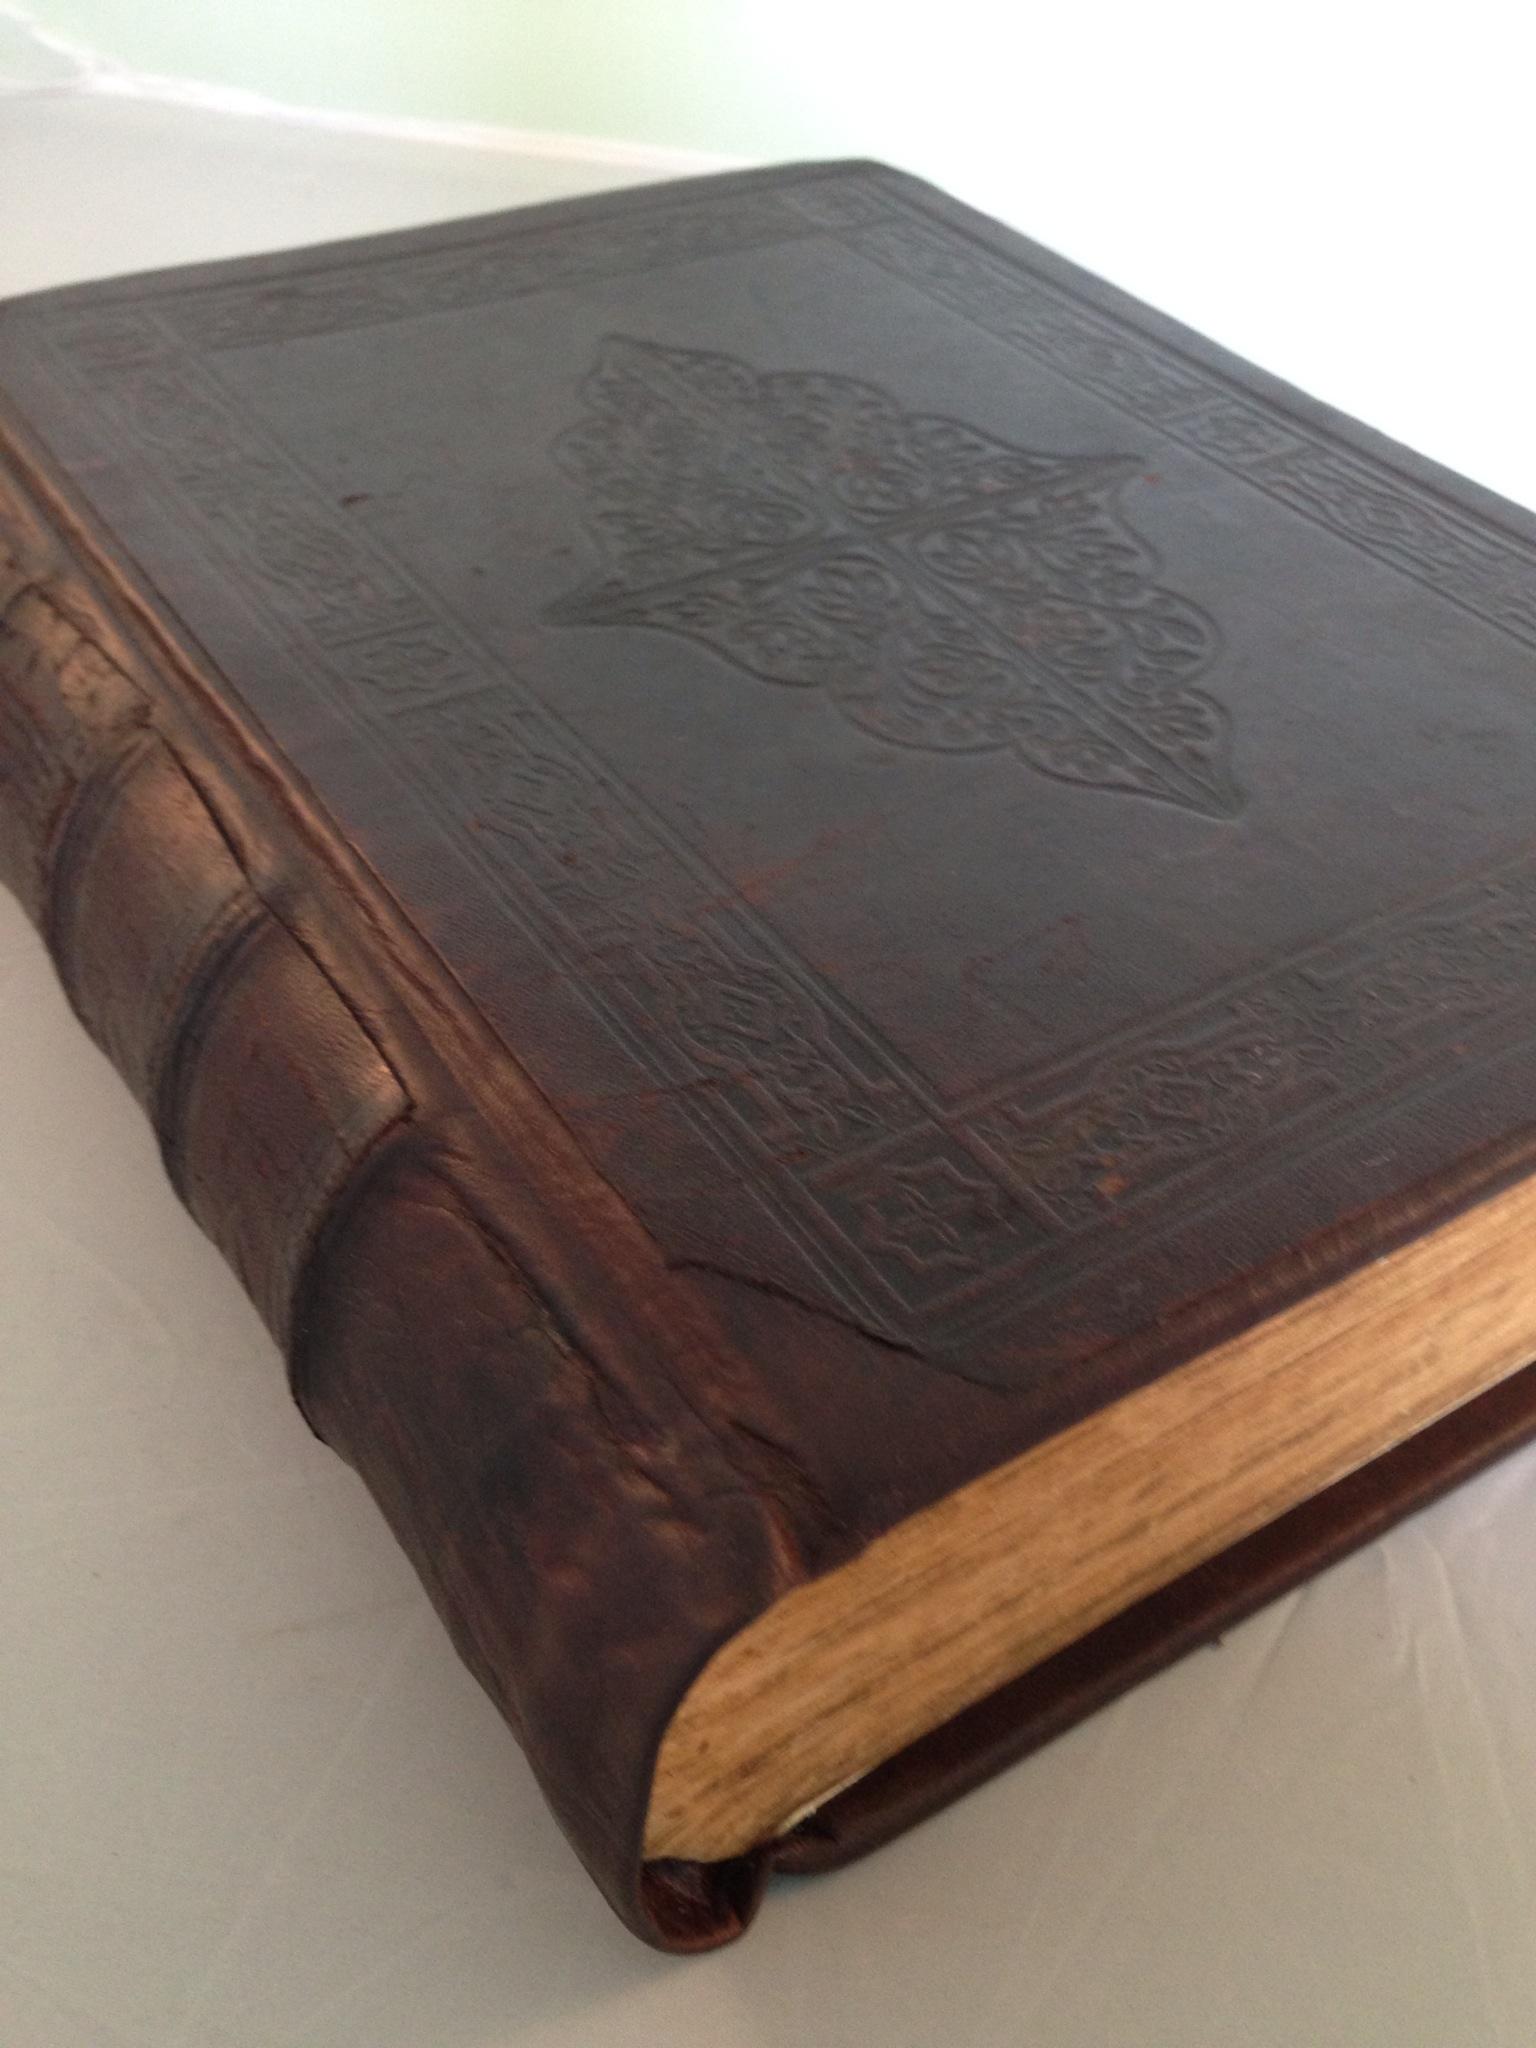 Book Restoration — Libris